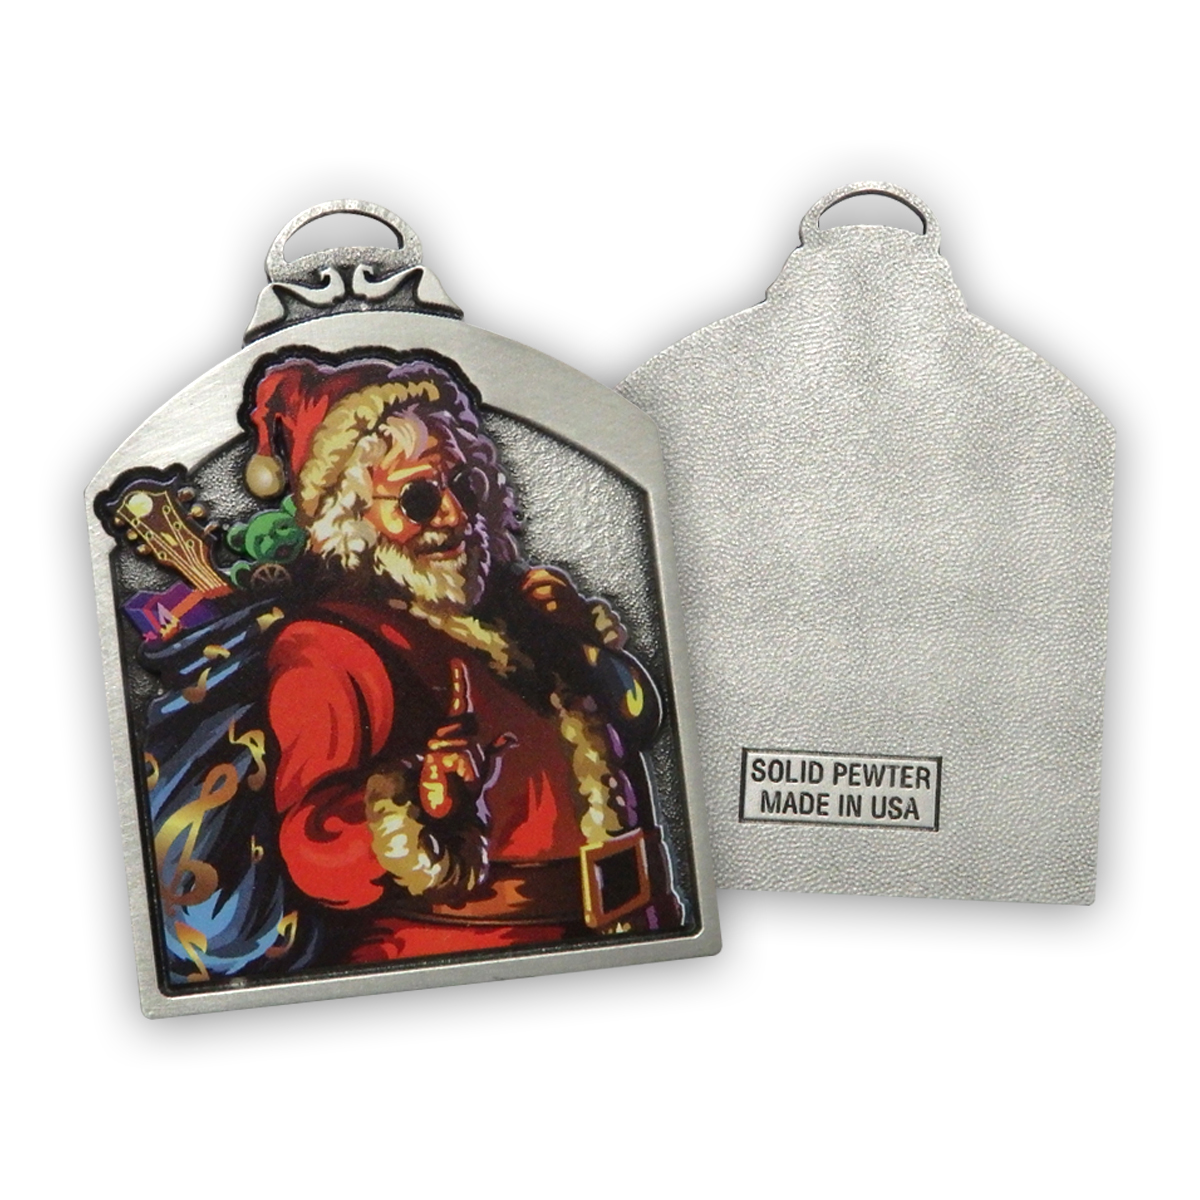 Santa Jerry Pewter Ornament